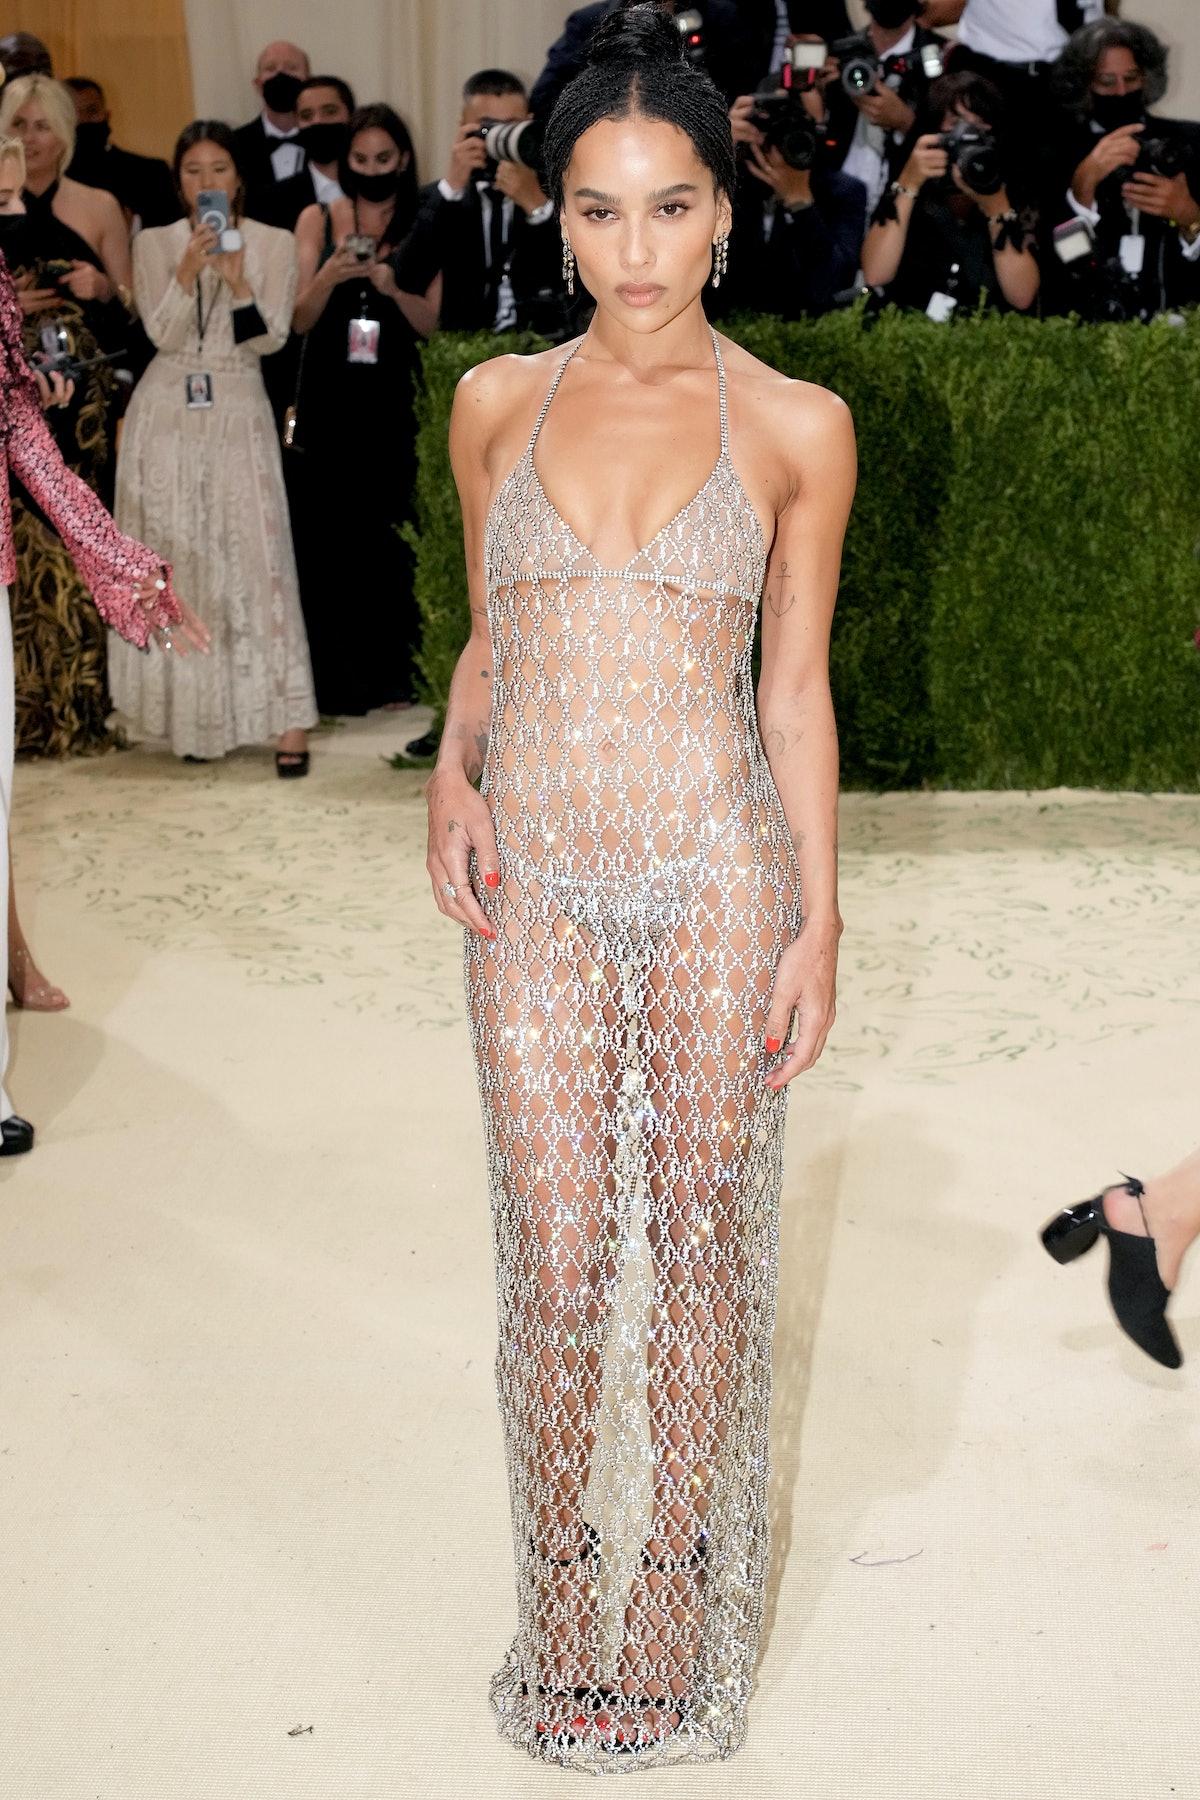 NEW YORK, NEW YORK - SEPTEMBER 13: Zoë Kravitz attends The 2021 Met Gala Celebrating In America: A L...